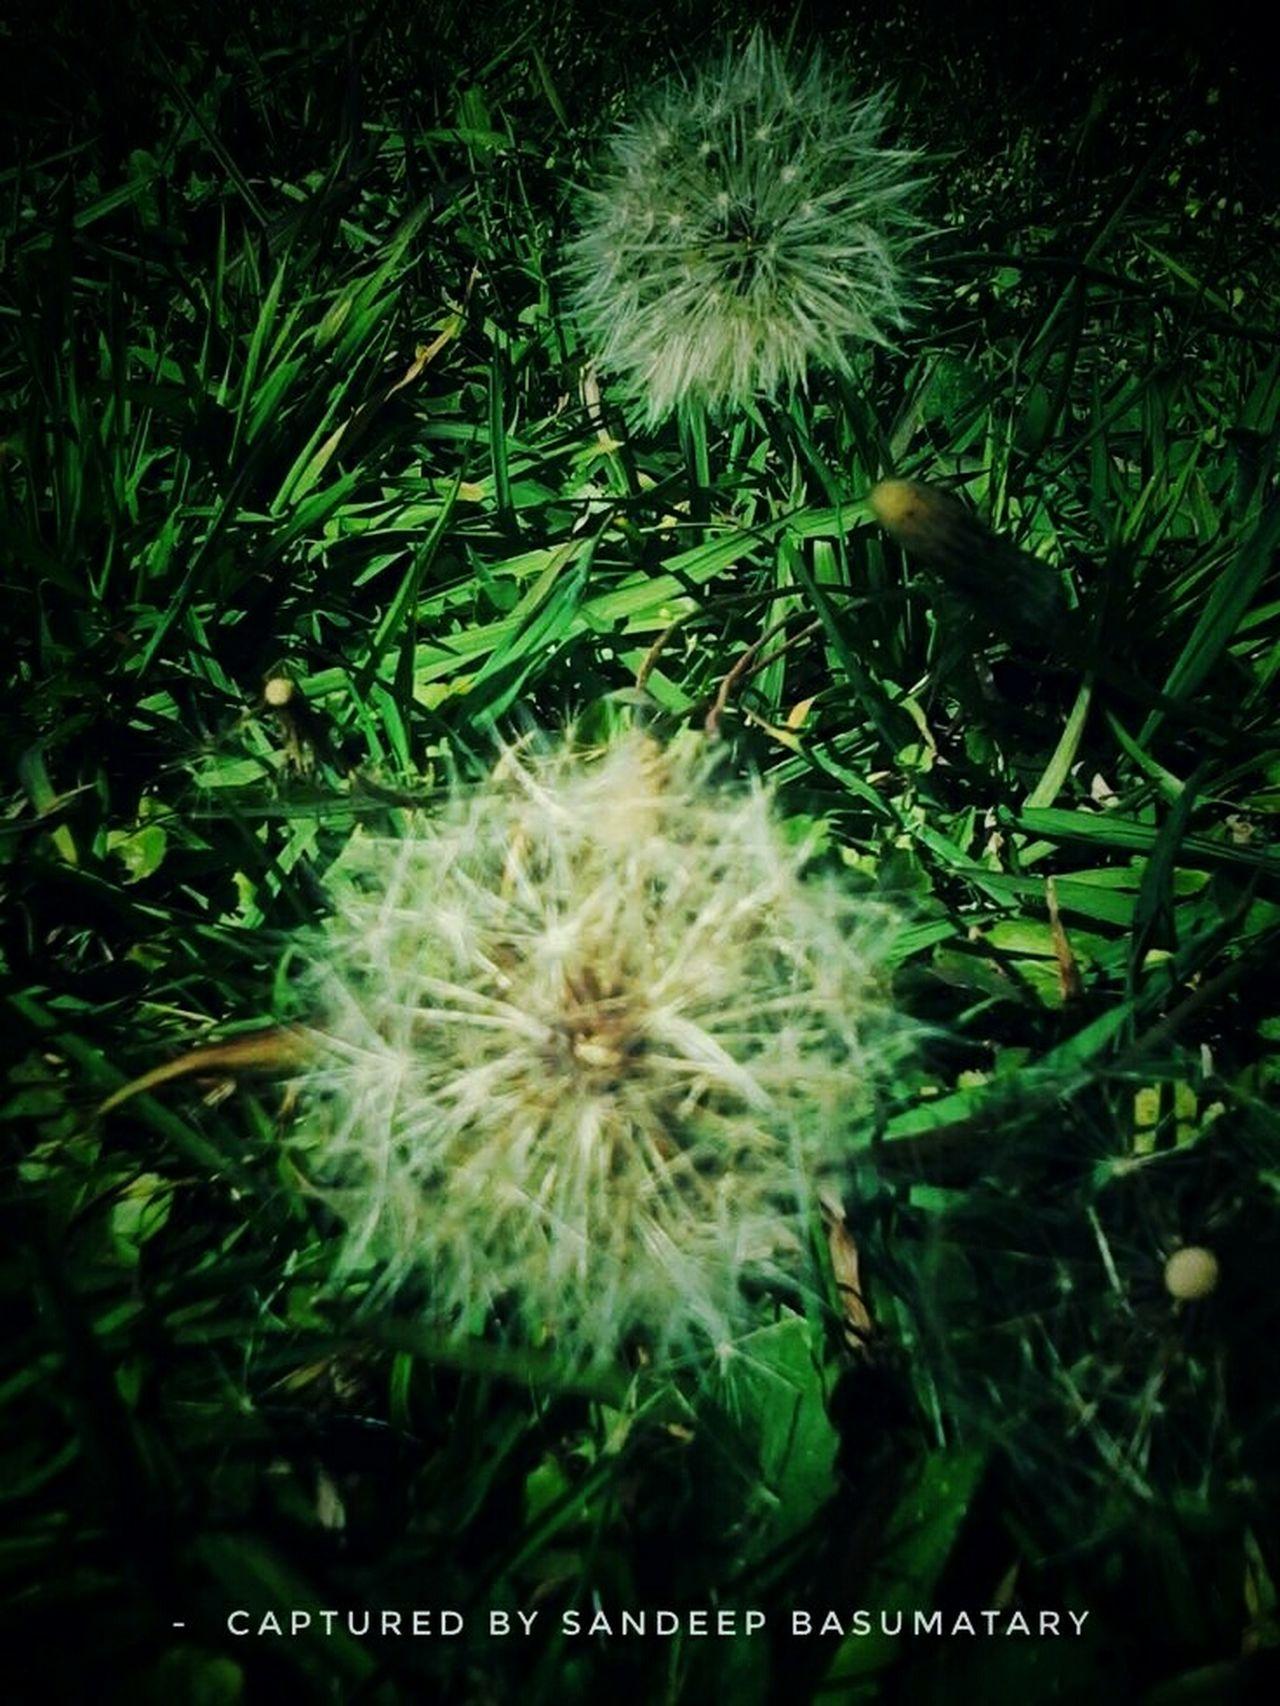 Winter Dandelions captured on late morning...